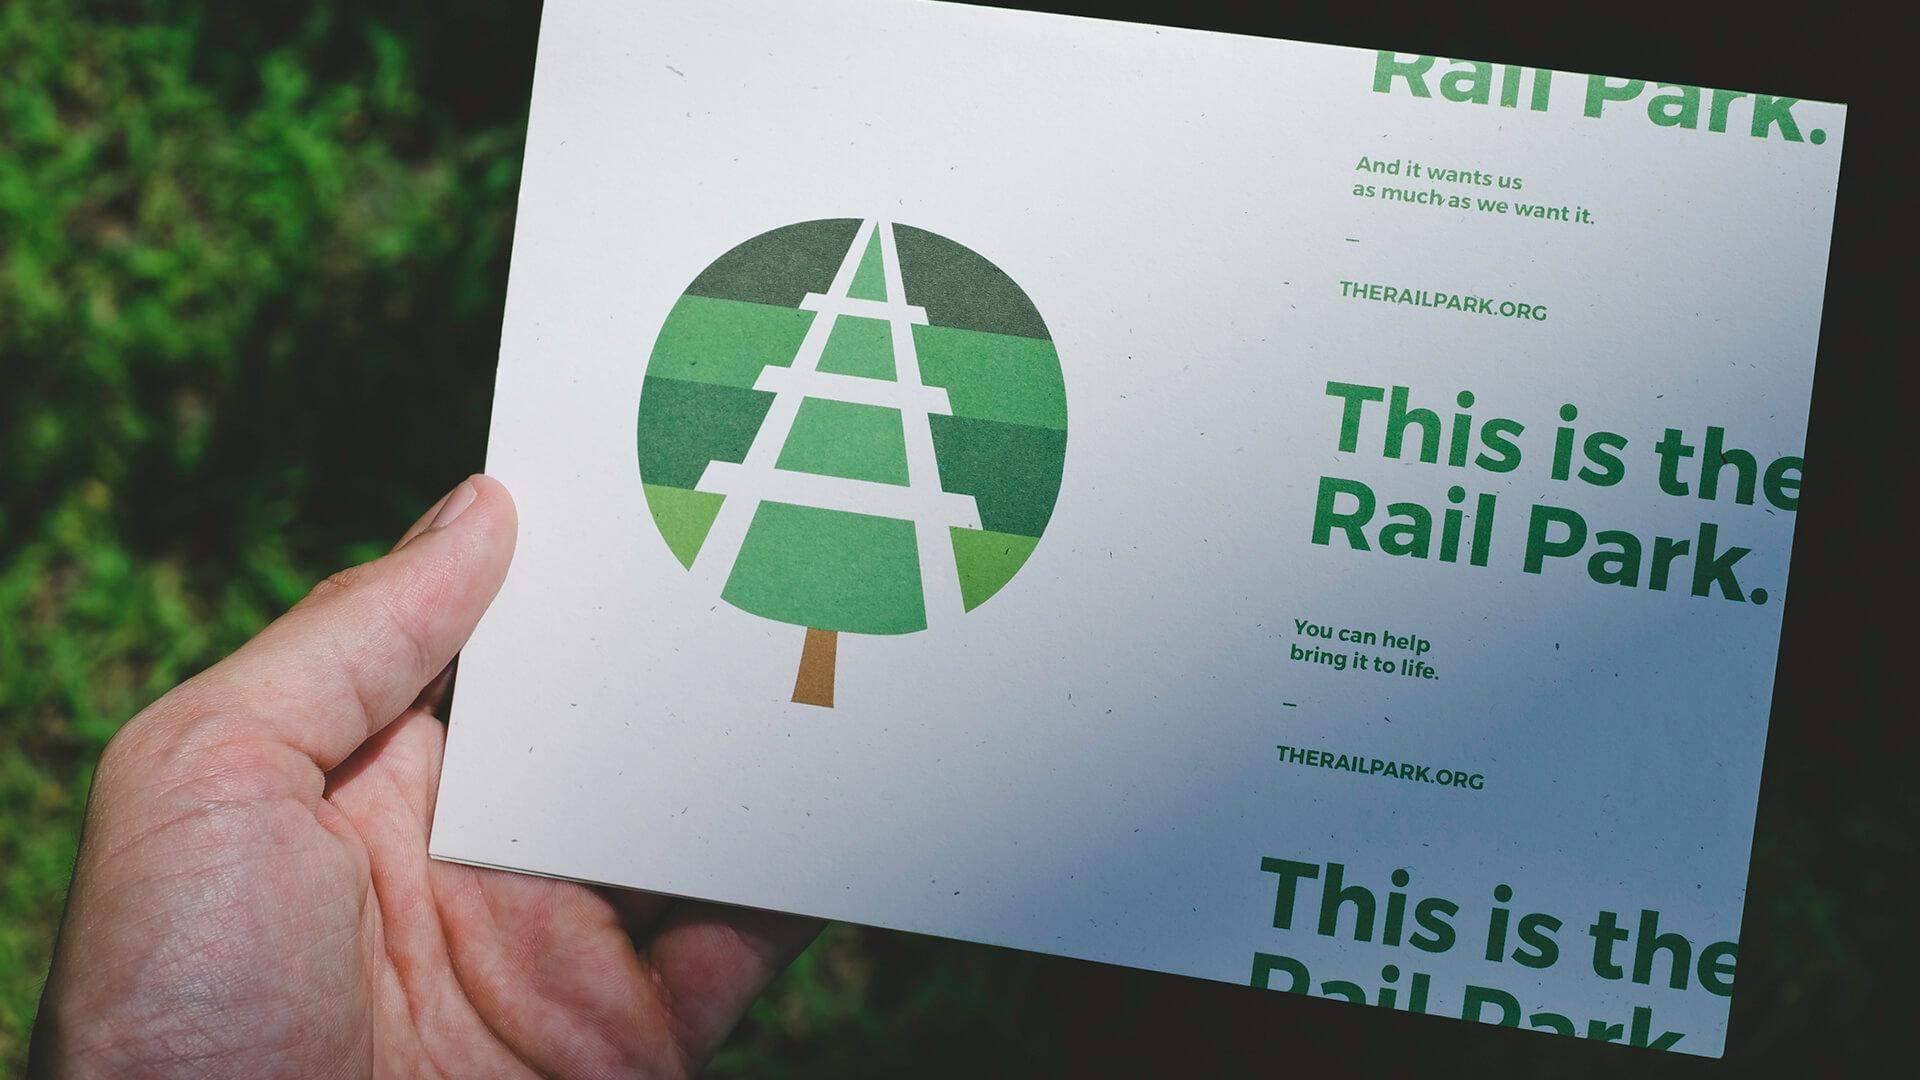 The Rail Park